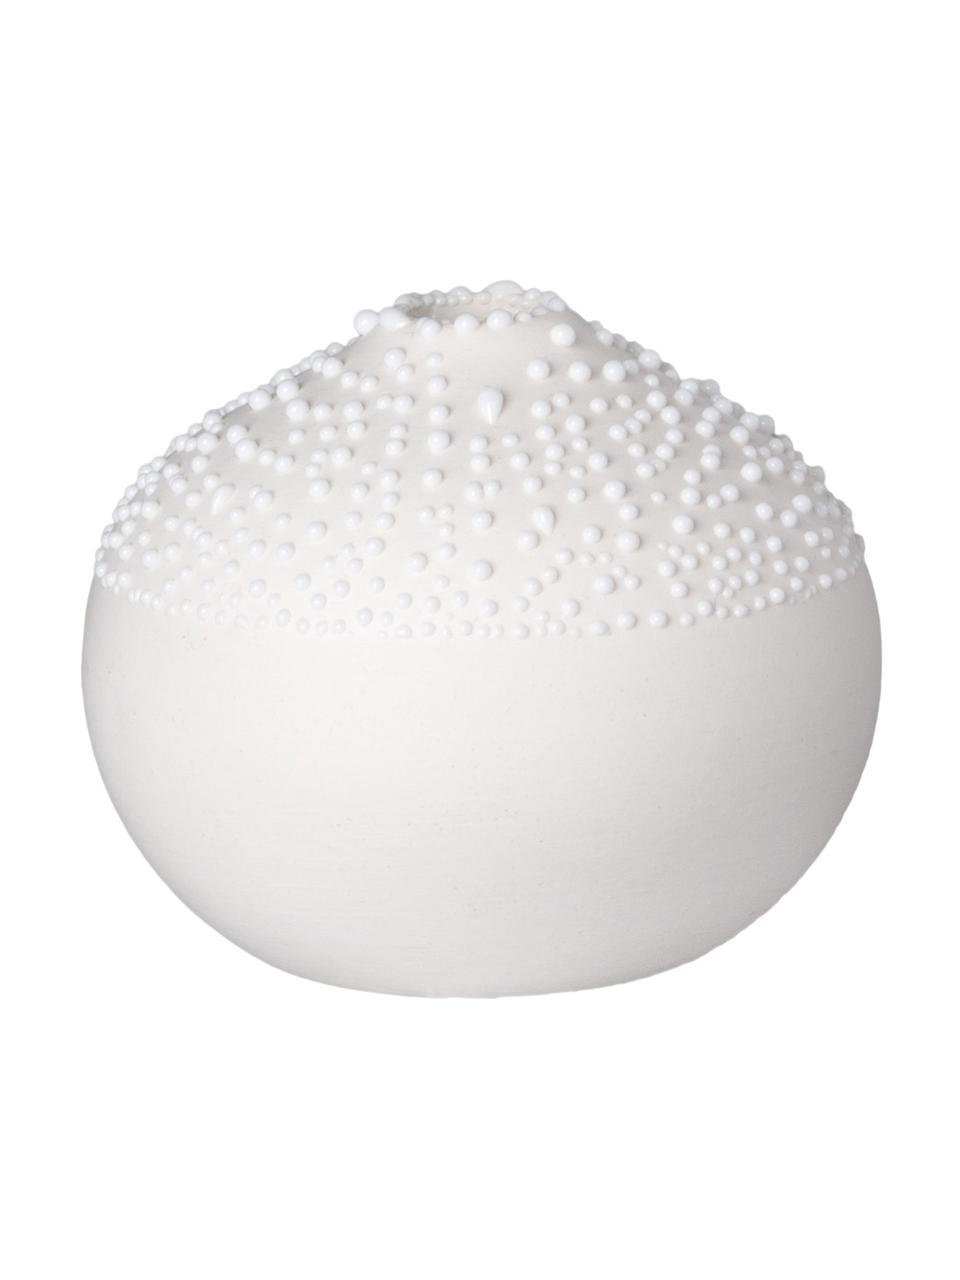 XS Porzellan-Vase Pearl, Porzellan, Weiß, Ø 5 x H 6 cm